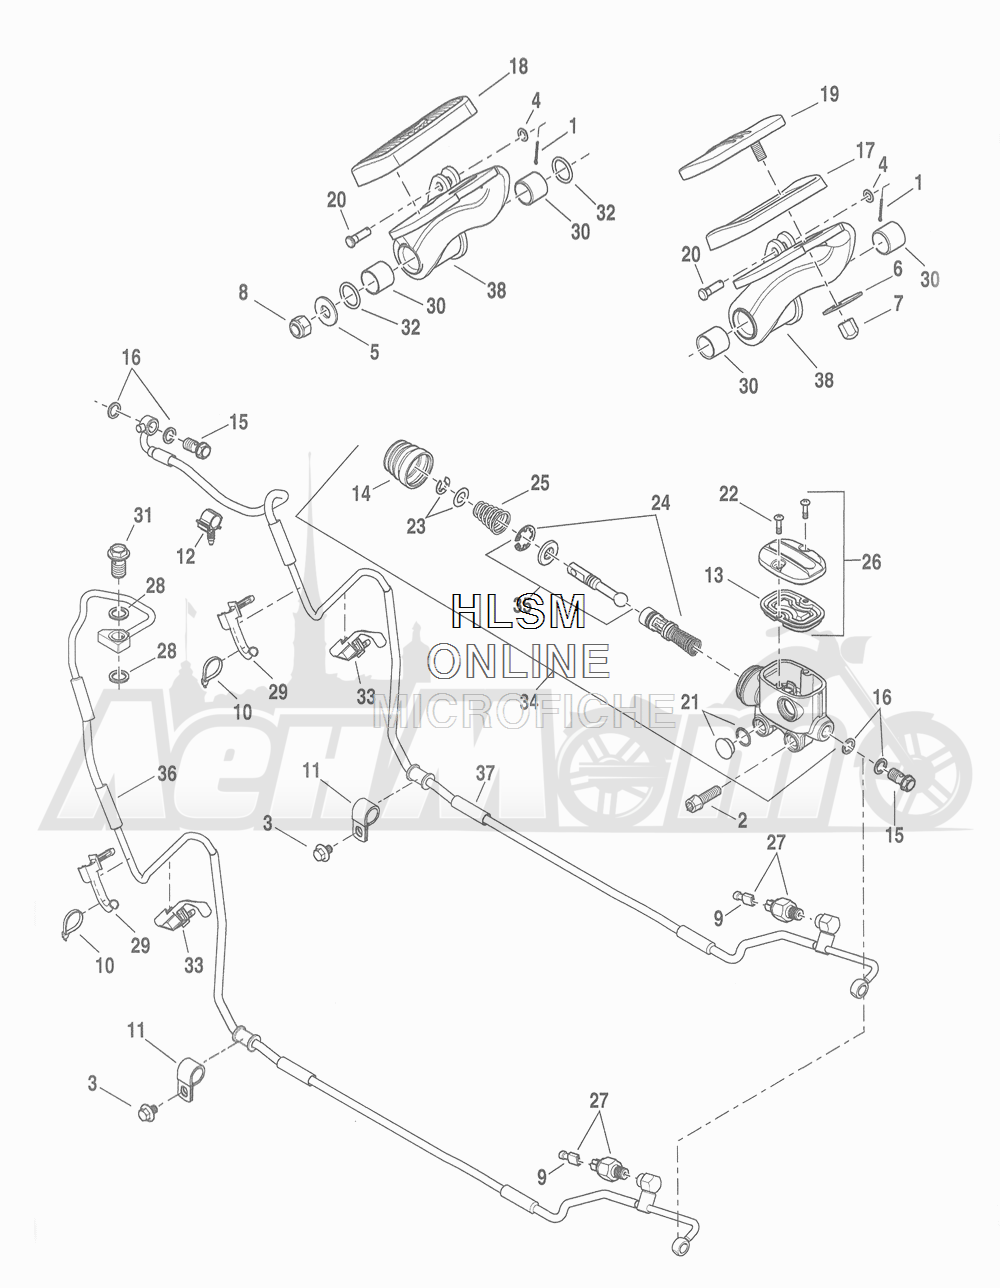 Запчасти для Мотоцикла Harley-Davidson 2016 FLHRC ROAD KING CLASSIC (FRM) Раздел: BRAKE - REAR BRAKE CYLINDER W/ PEDAL | задний тормоз тормоза цилиндр вместе с педаль